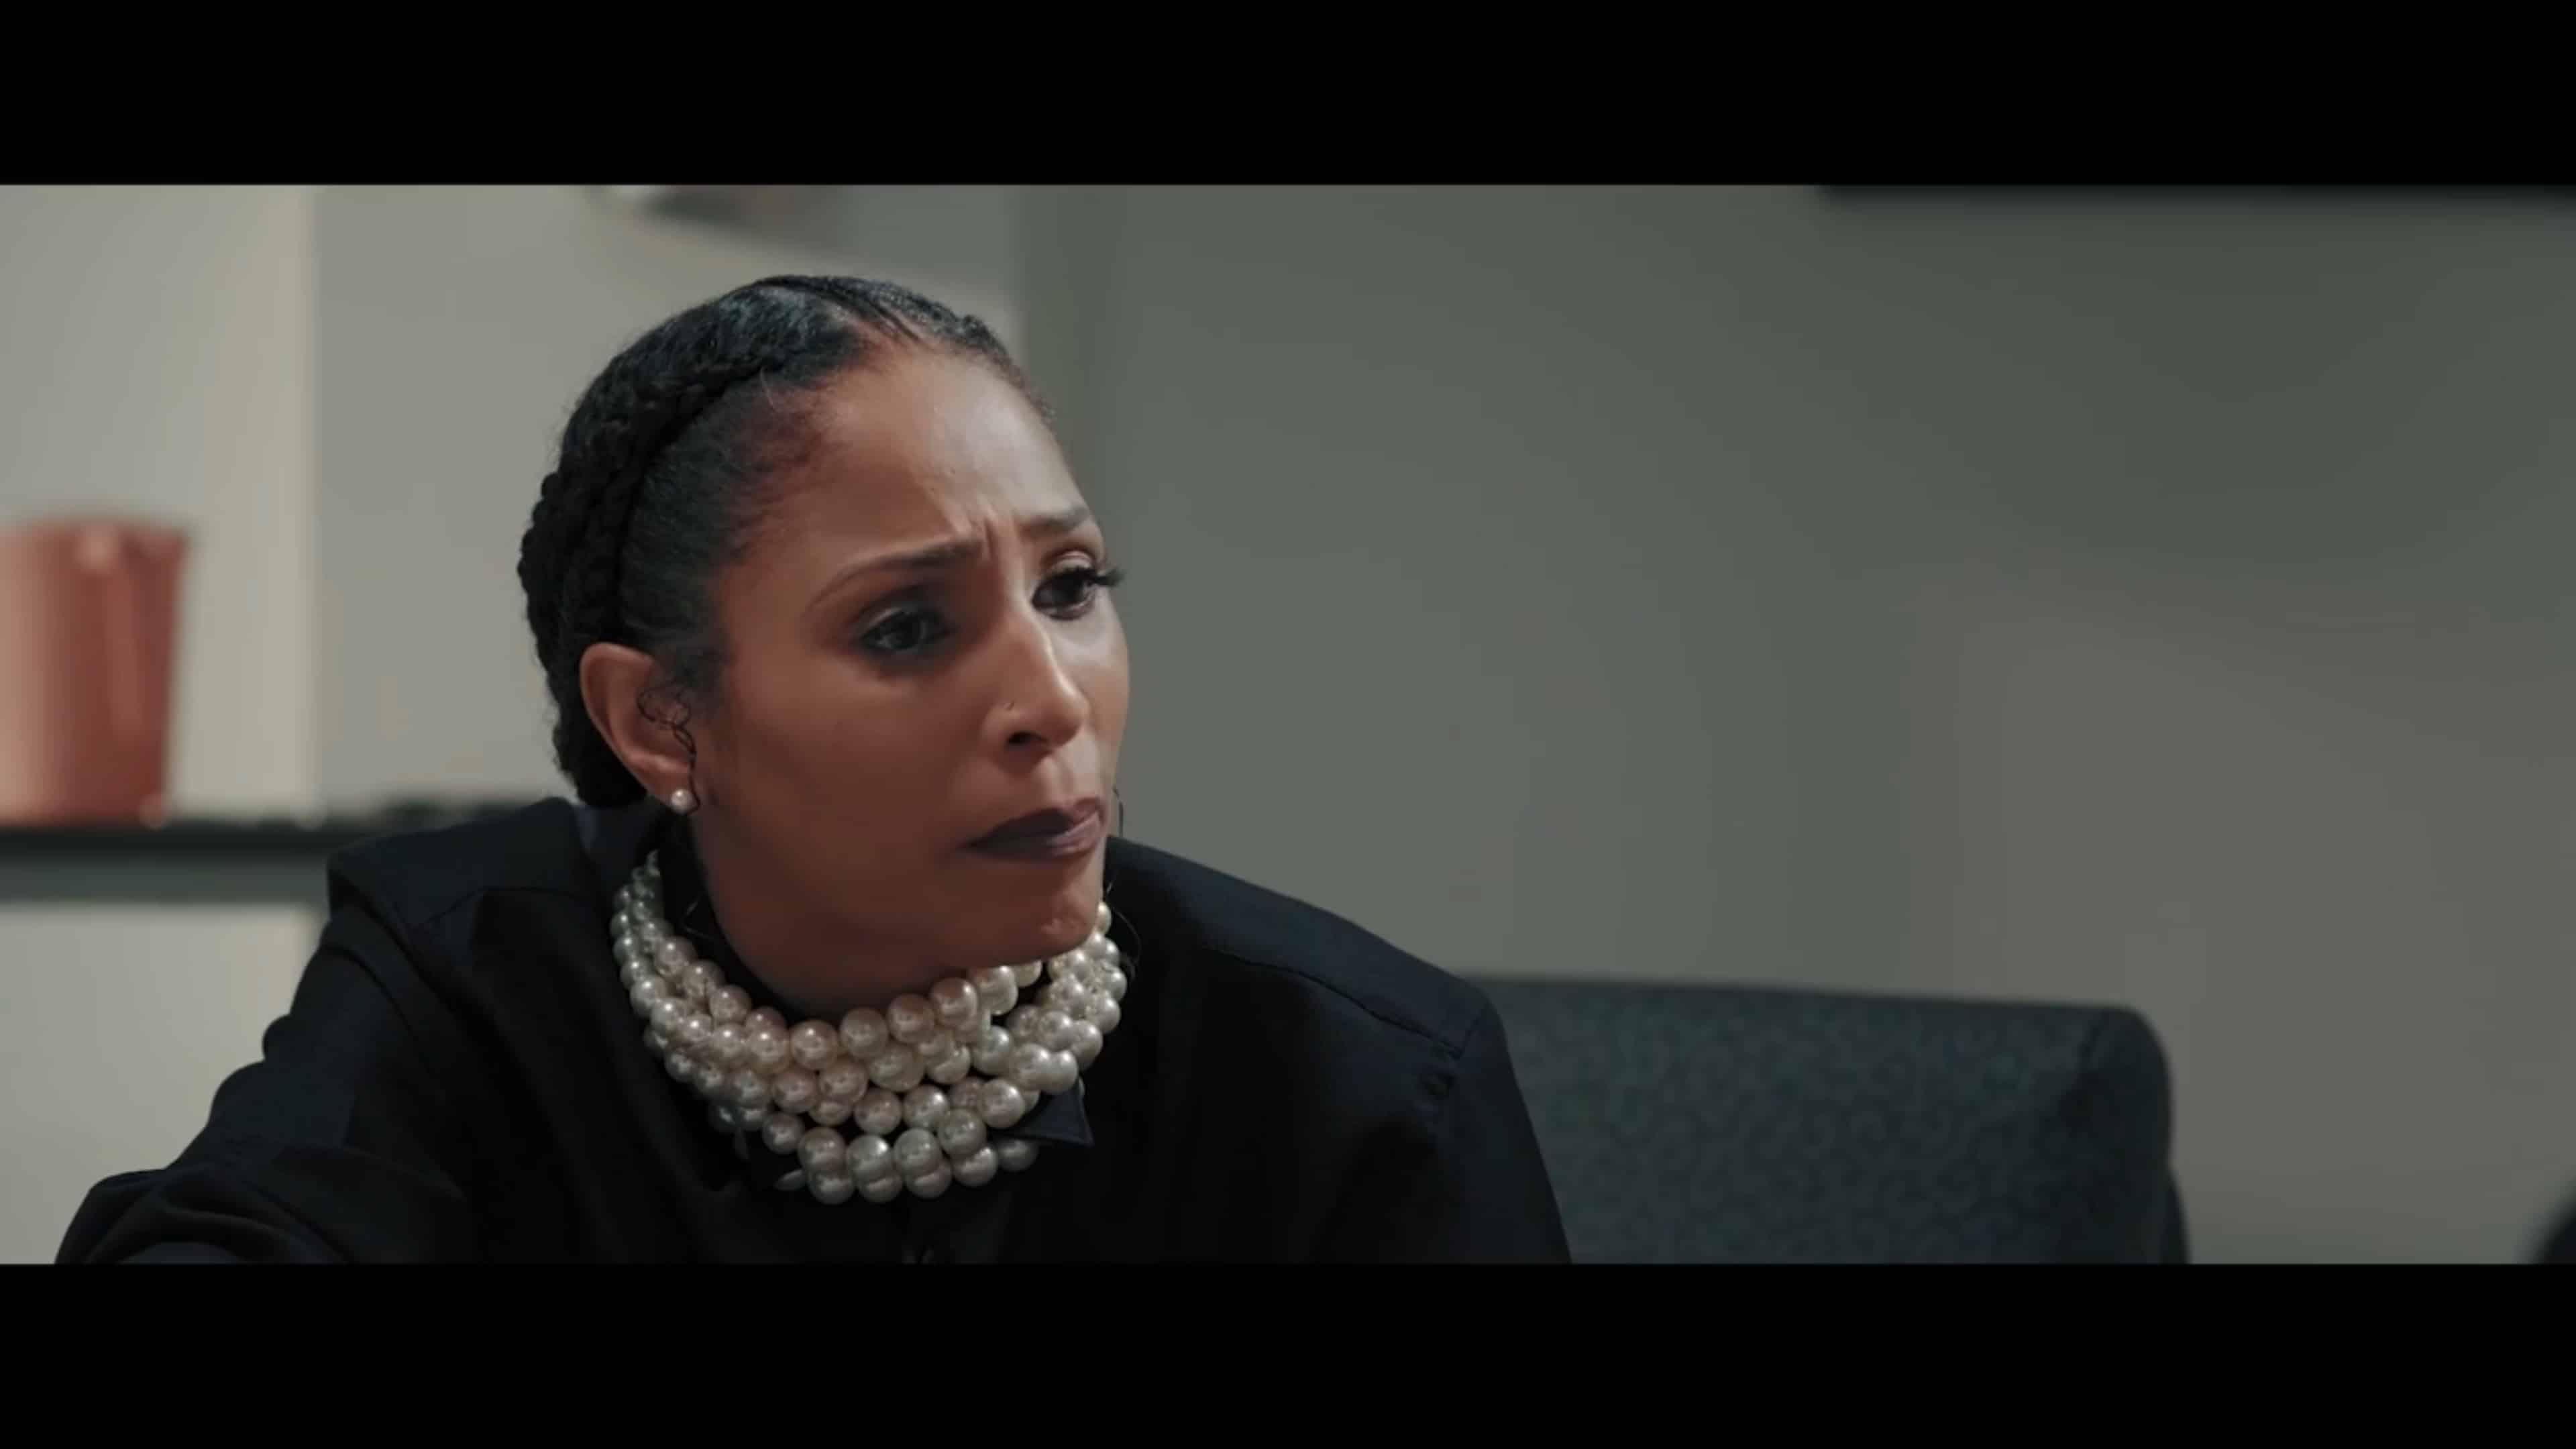 Tanya (Candice Van Beauty) talking to her husband, Detective Ryan